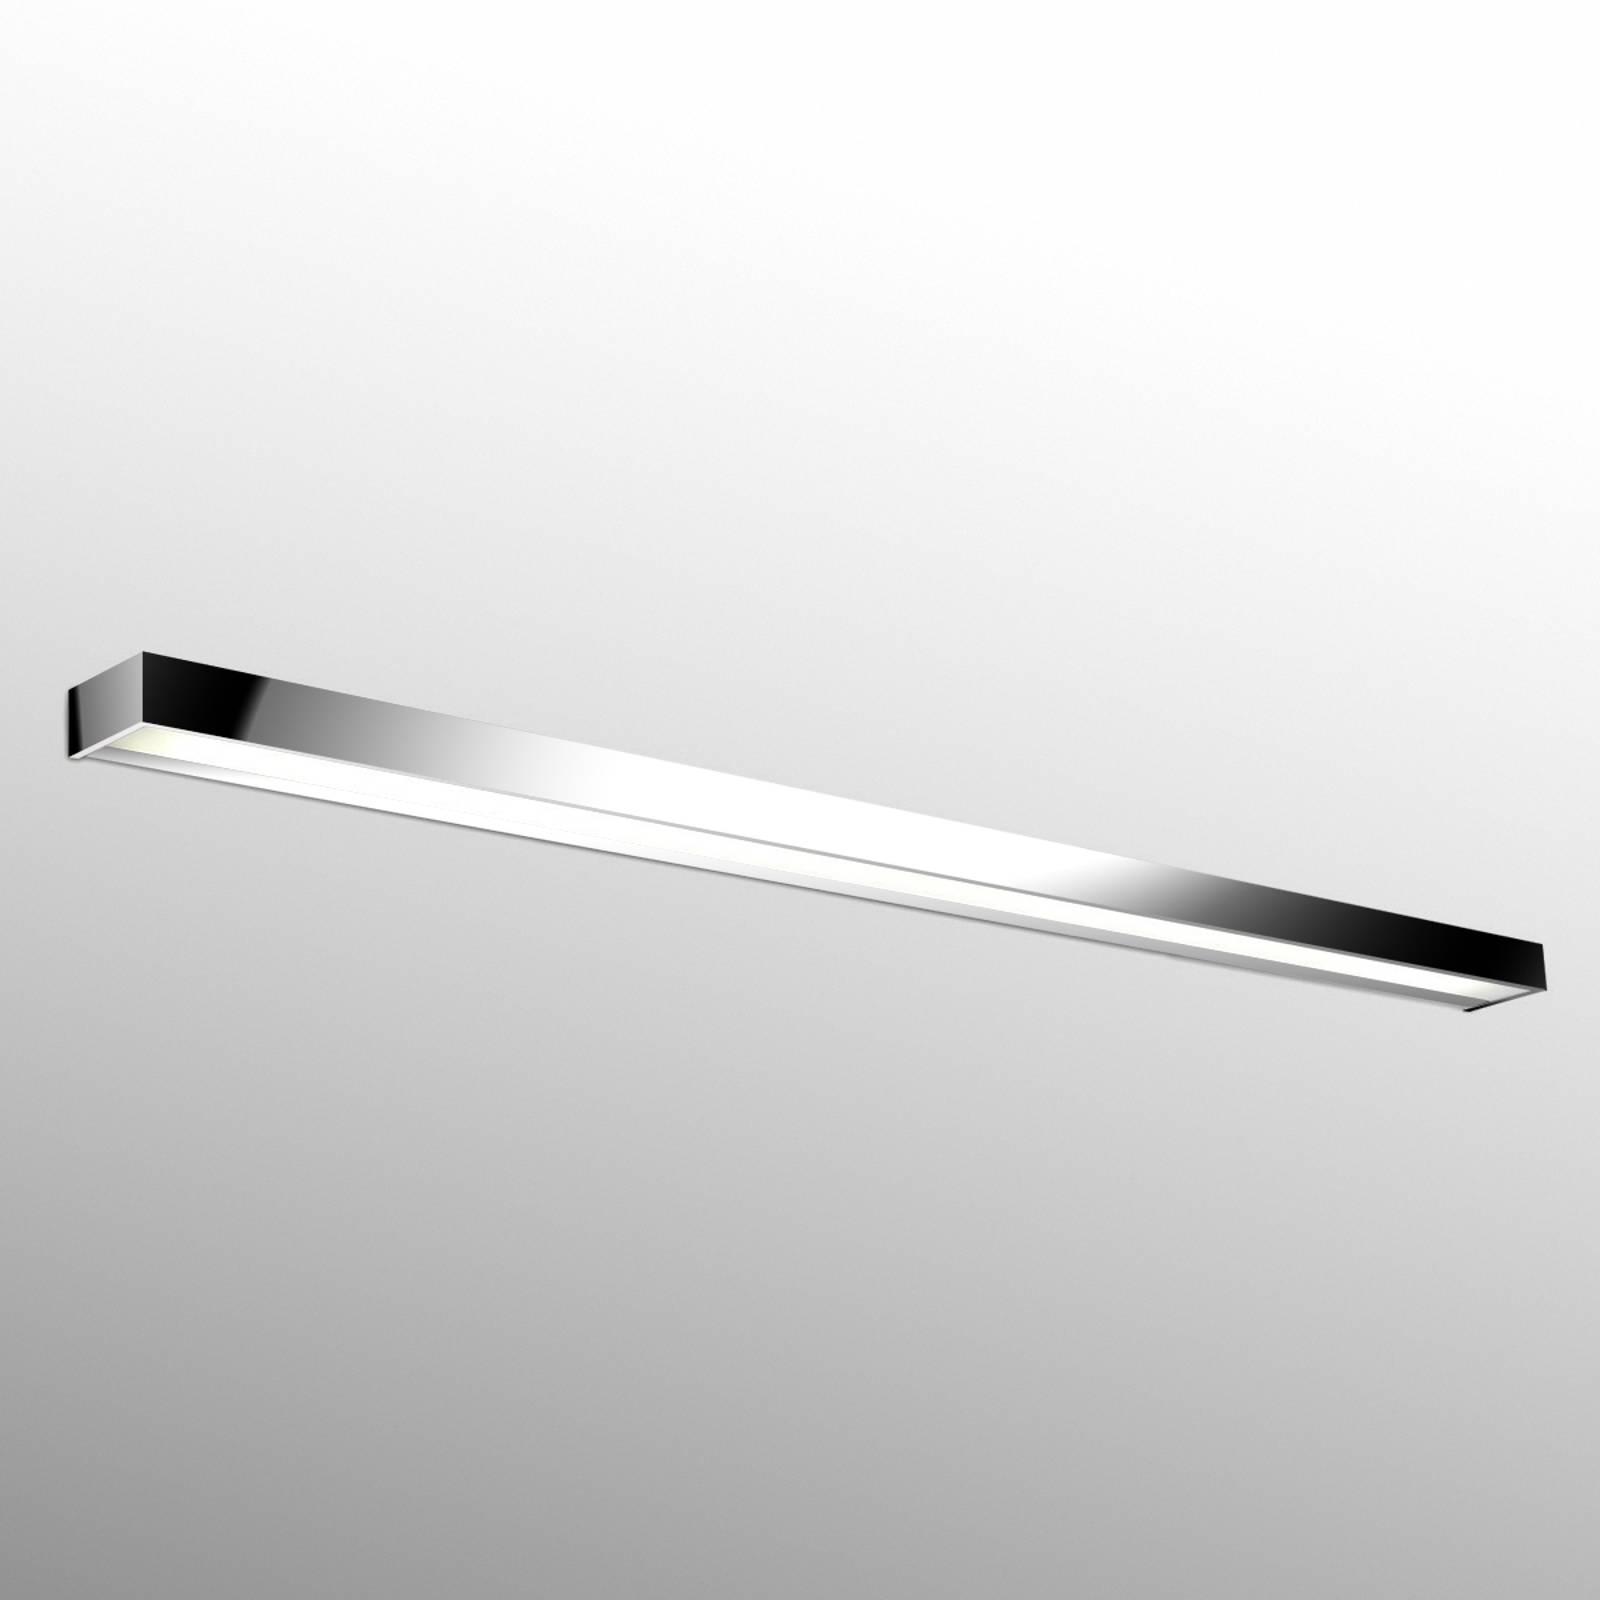 Hervorragende LED-Wandleuchte Apolo, 150cm chrom